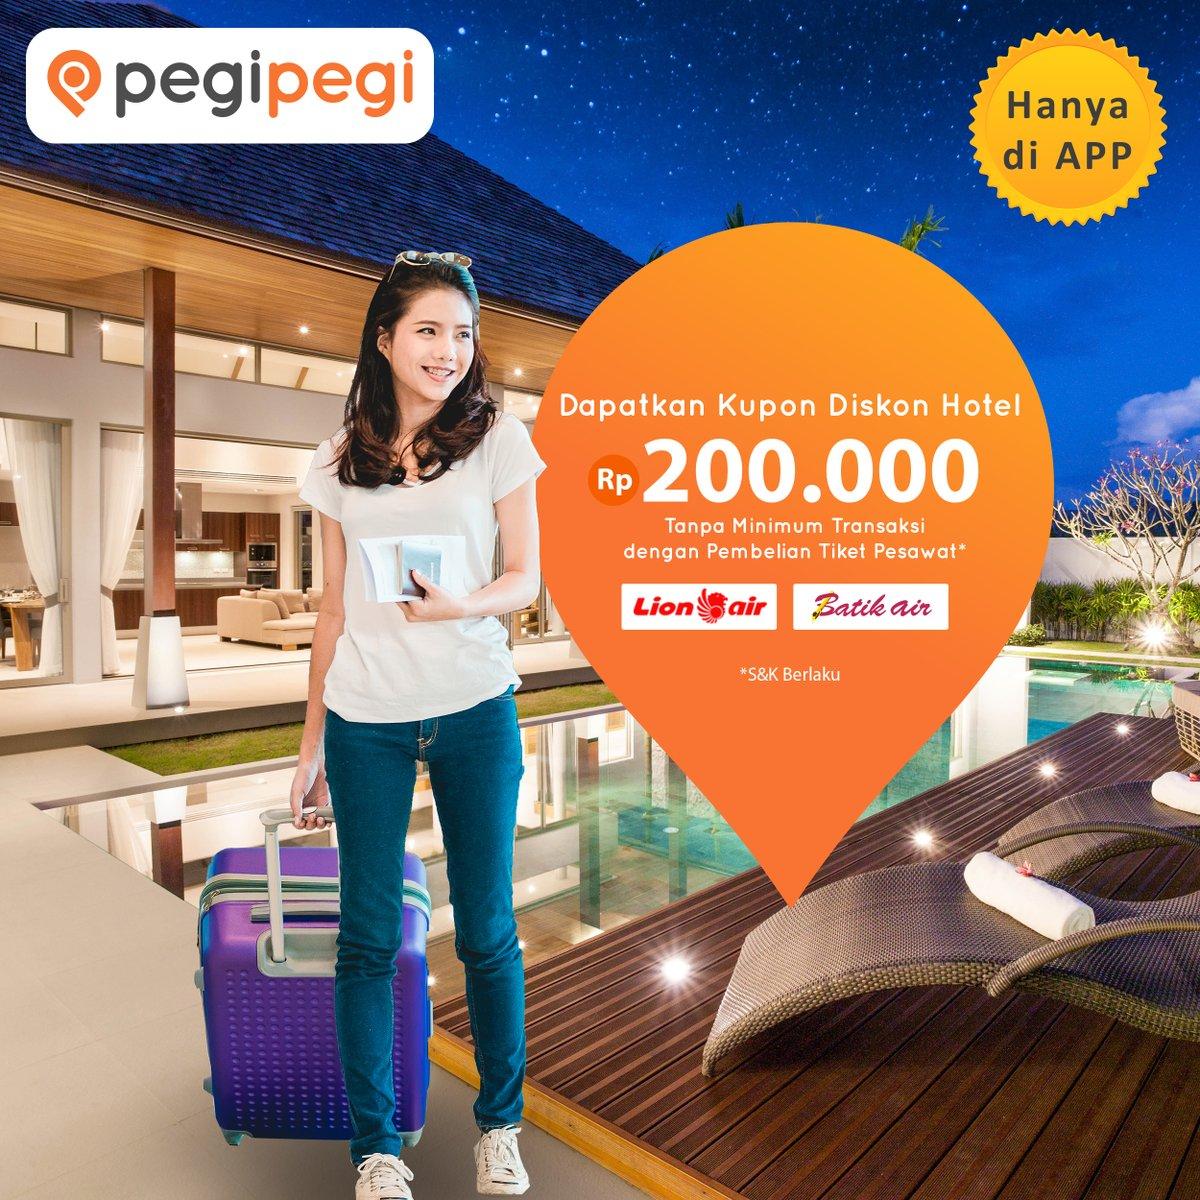 PegiPegi - Promo Beli Tiket Lion Air & Batir Air GRATIS Kupon Voucher Hotel 200 Ribu